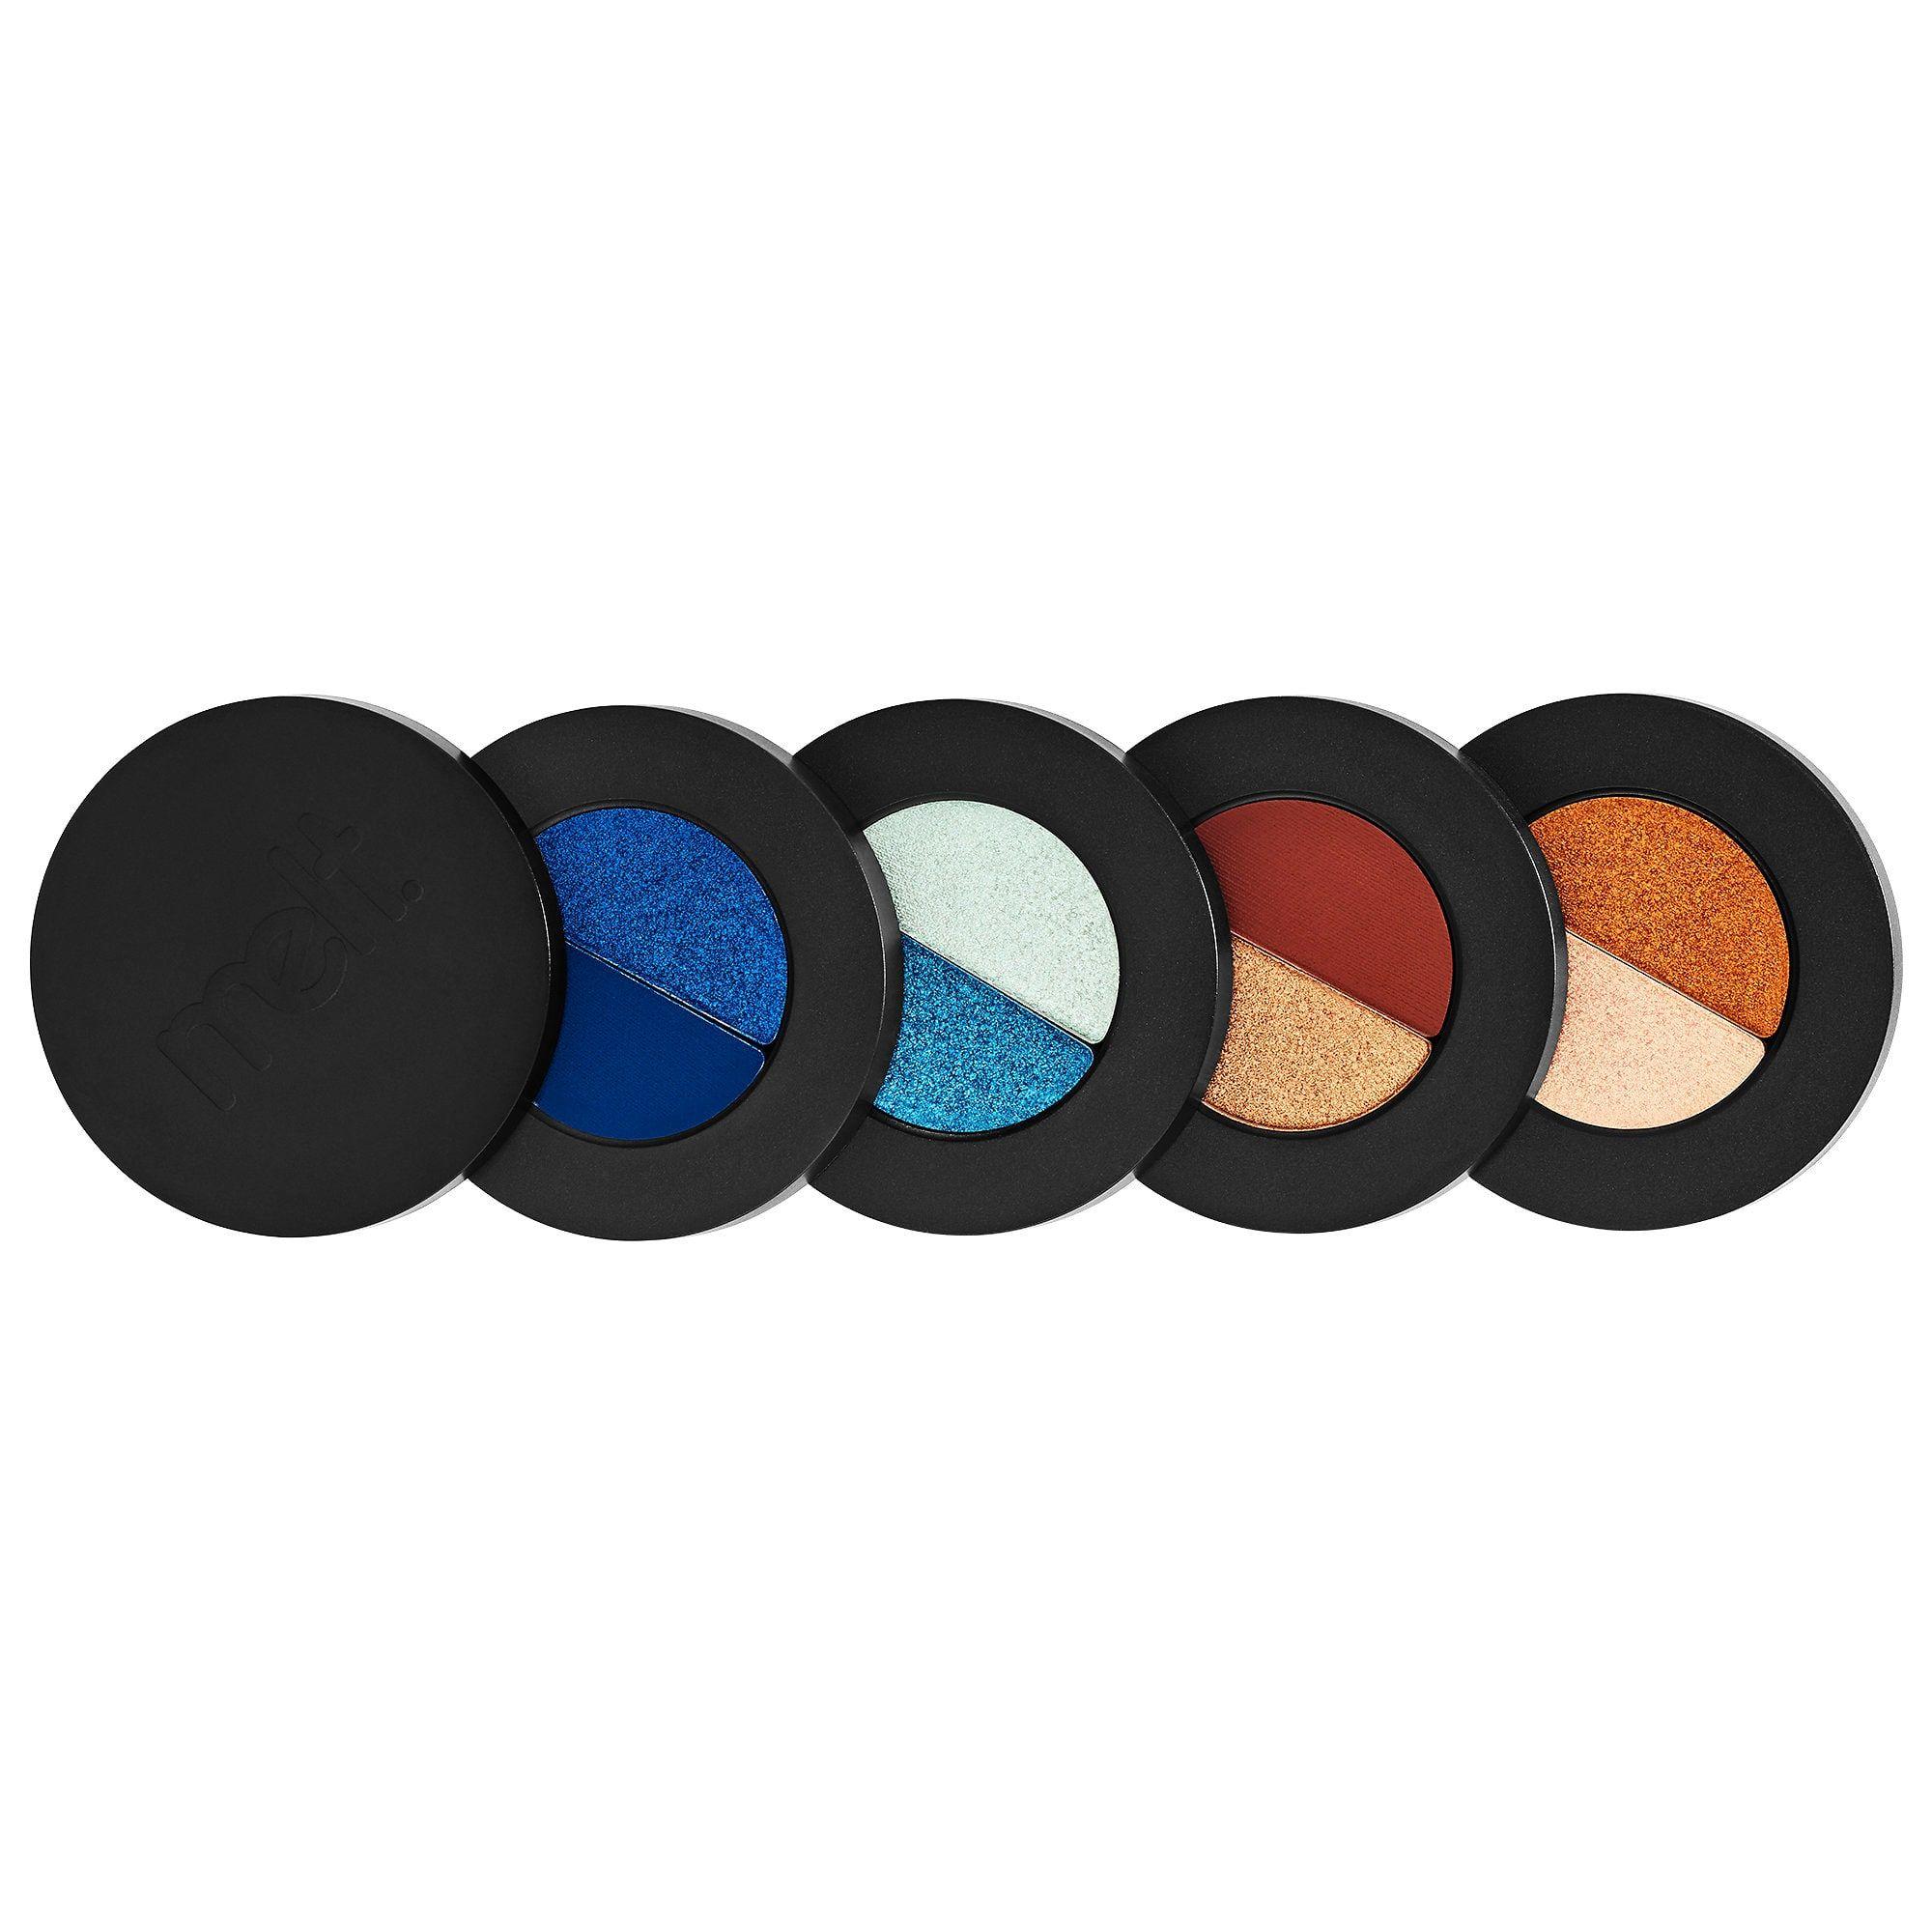 Melt Cosmetics Blueprint Eyeshadow Palette Stack 0.42 oz